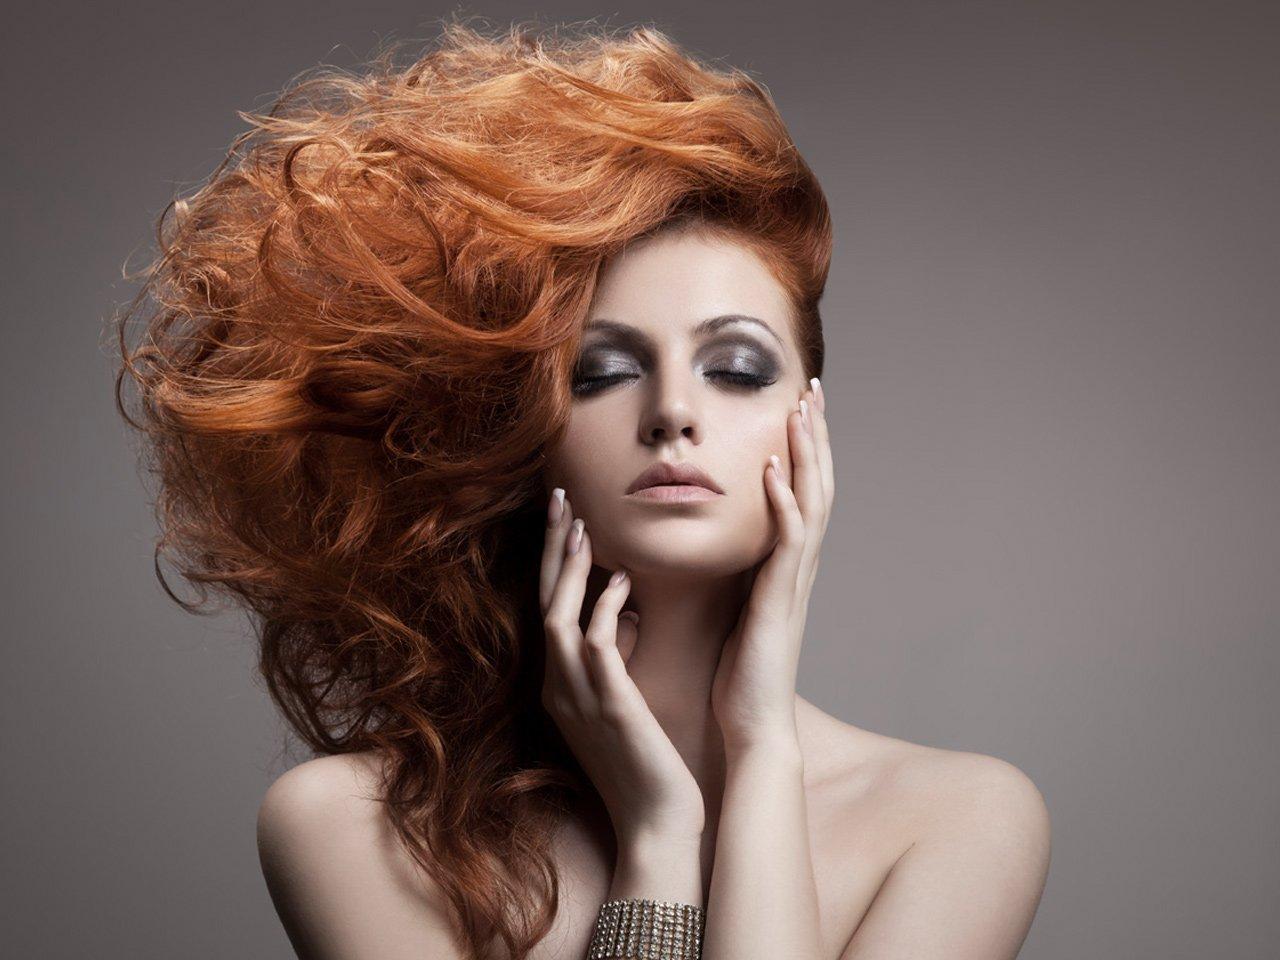 Sesto Senso Estetica parrucchiere Parma